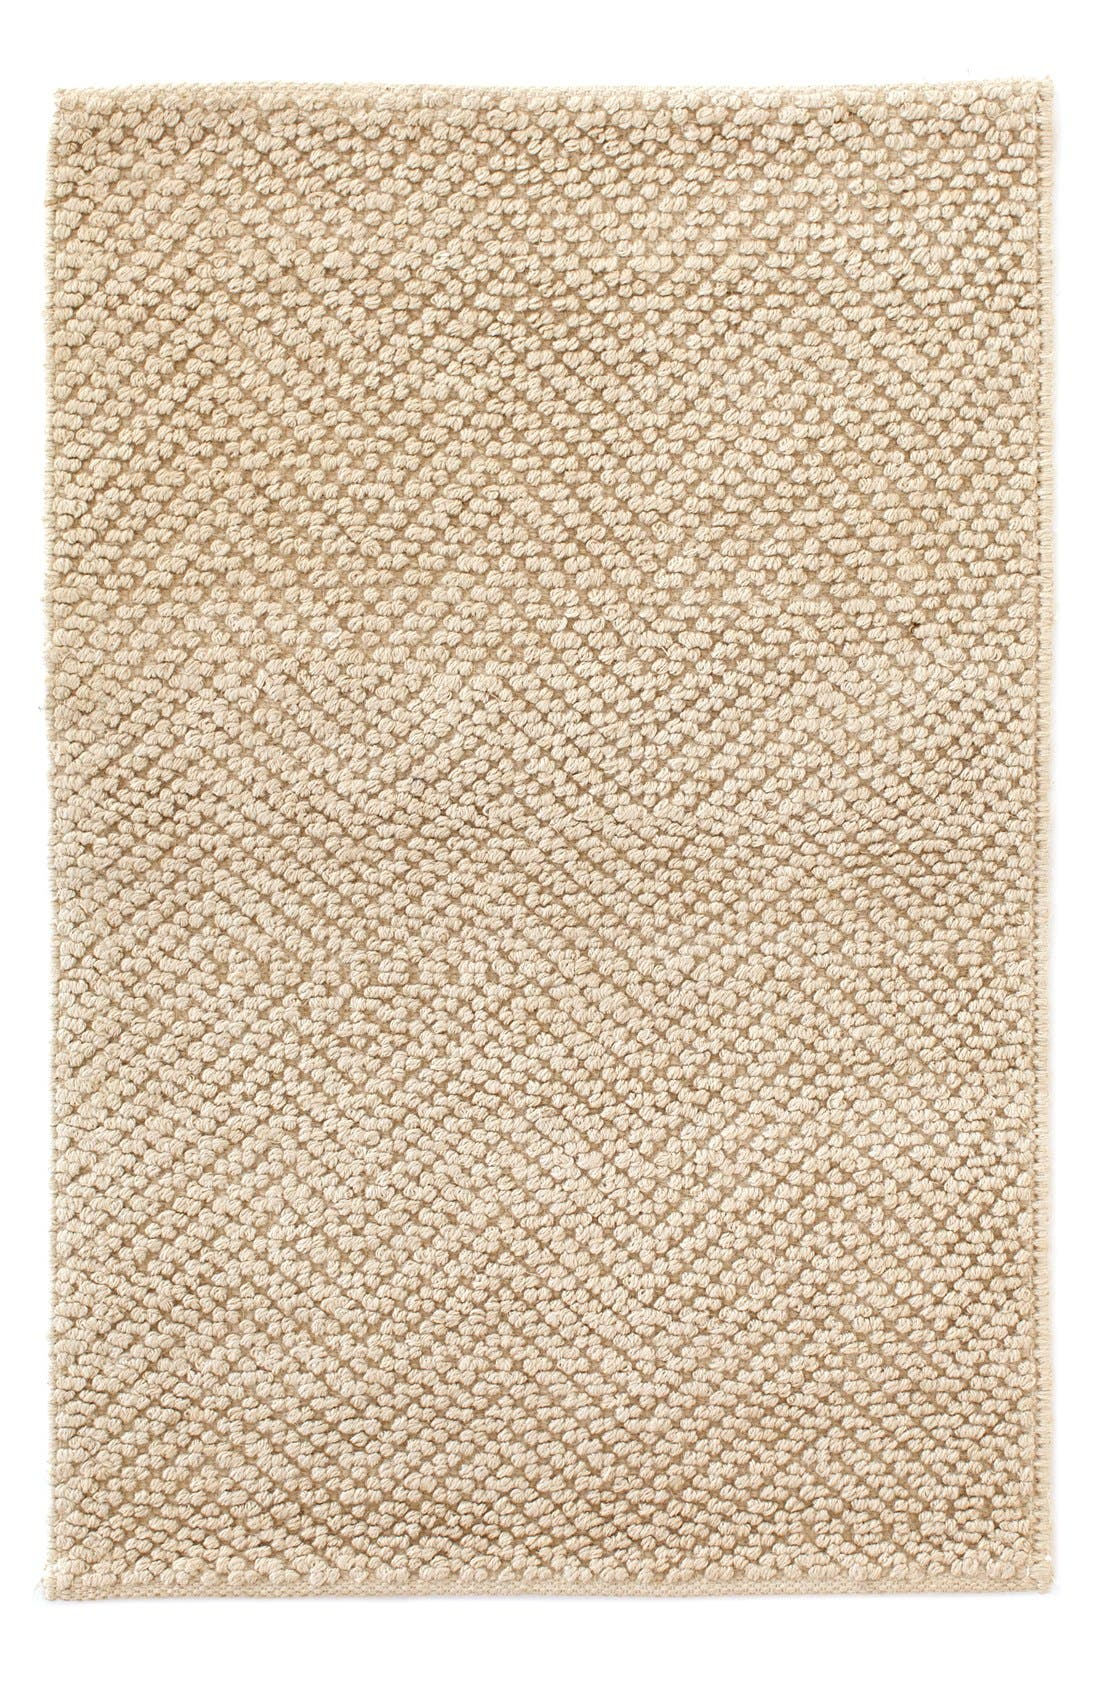 Woven Jute & Cotton Rug,                         Main,                         color, Sand